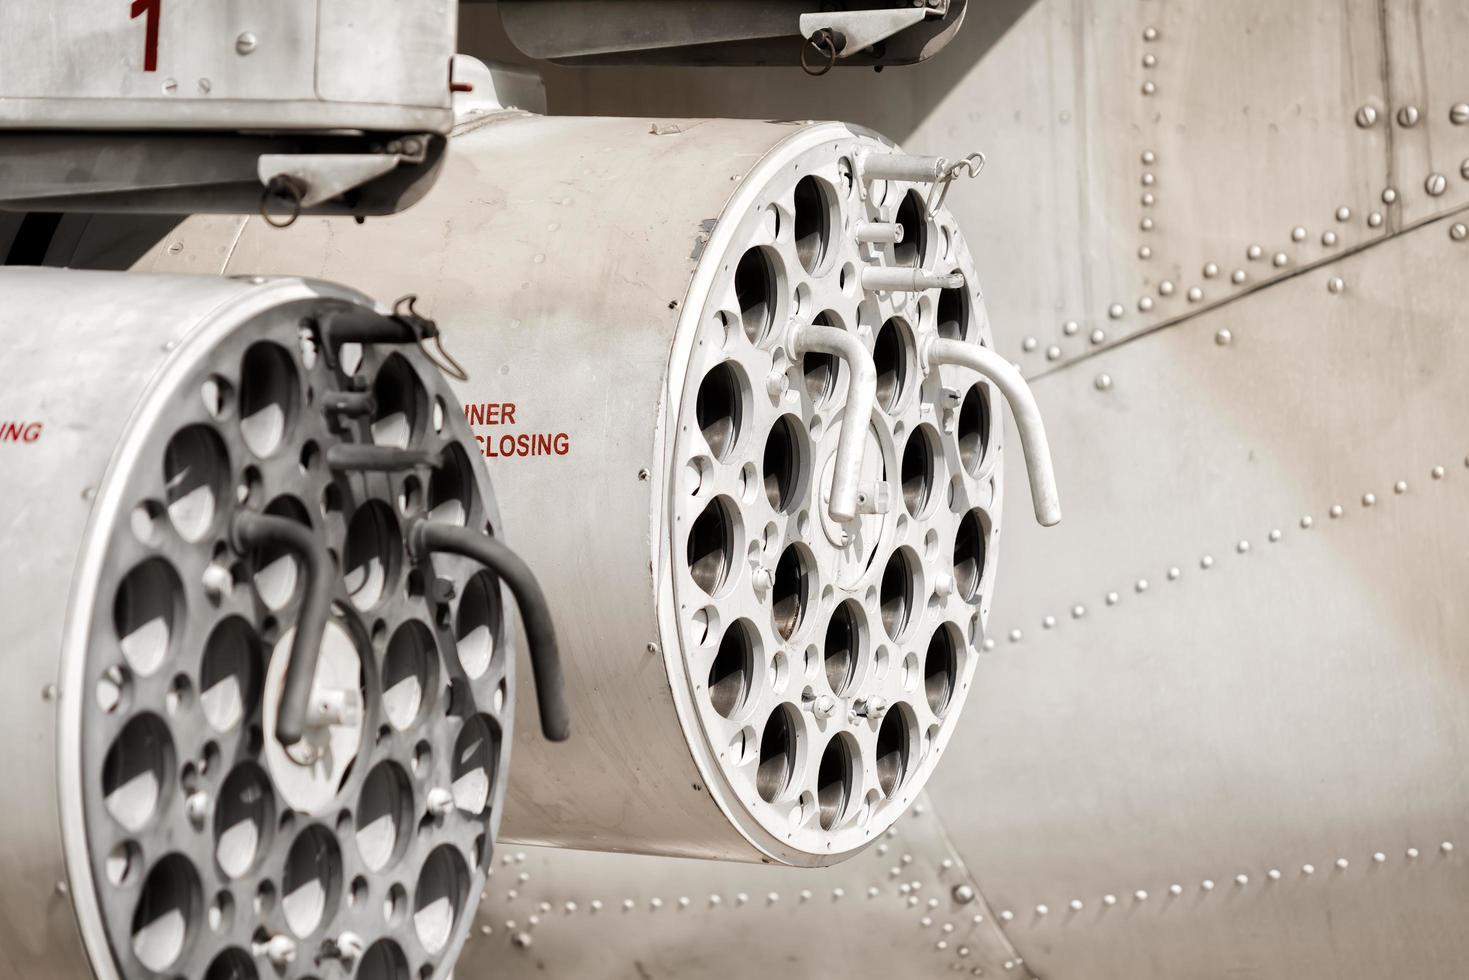 raketkoepel helikopter gunship foto